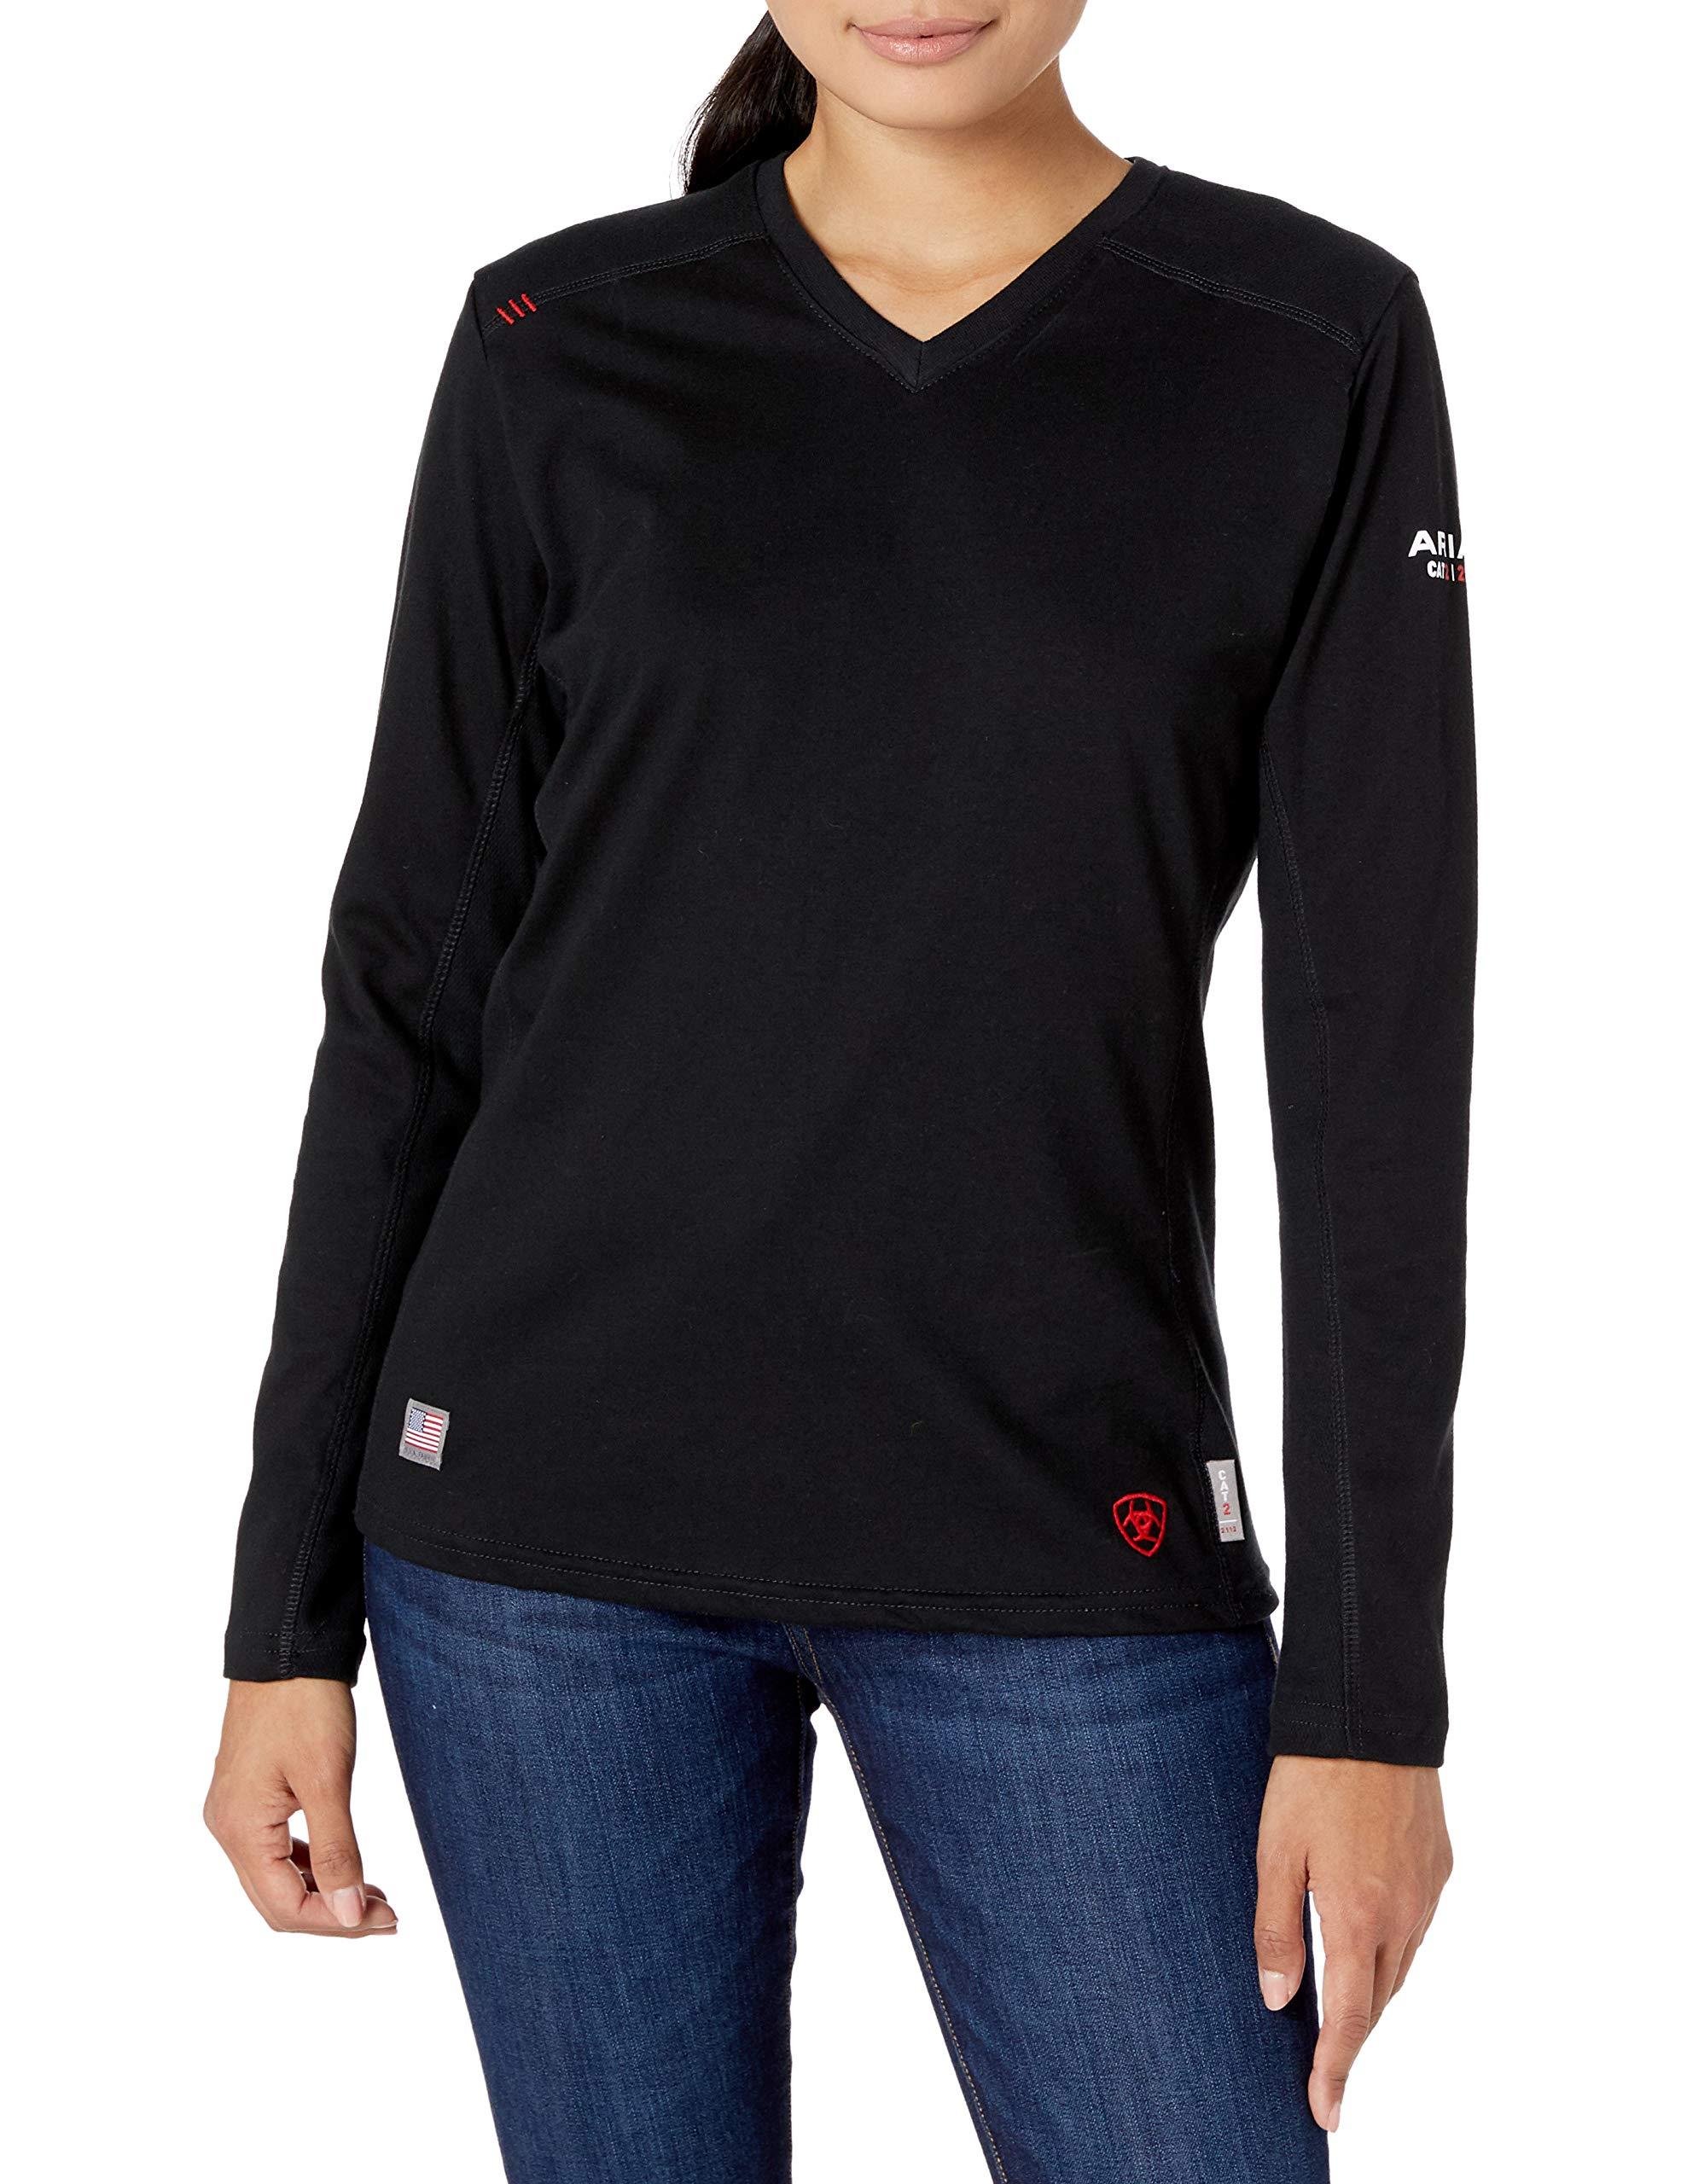 Ariat Women's Flame Resistant Ac TopWork Utility Tee Shirt